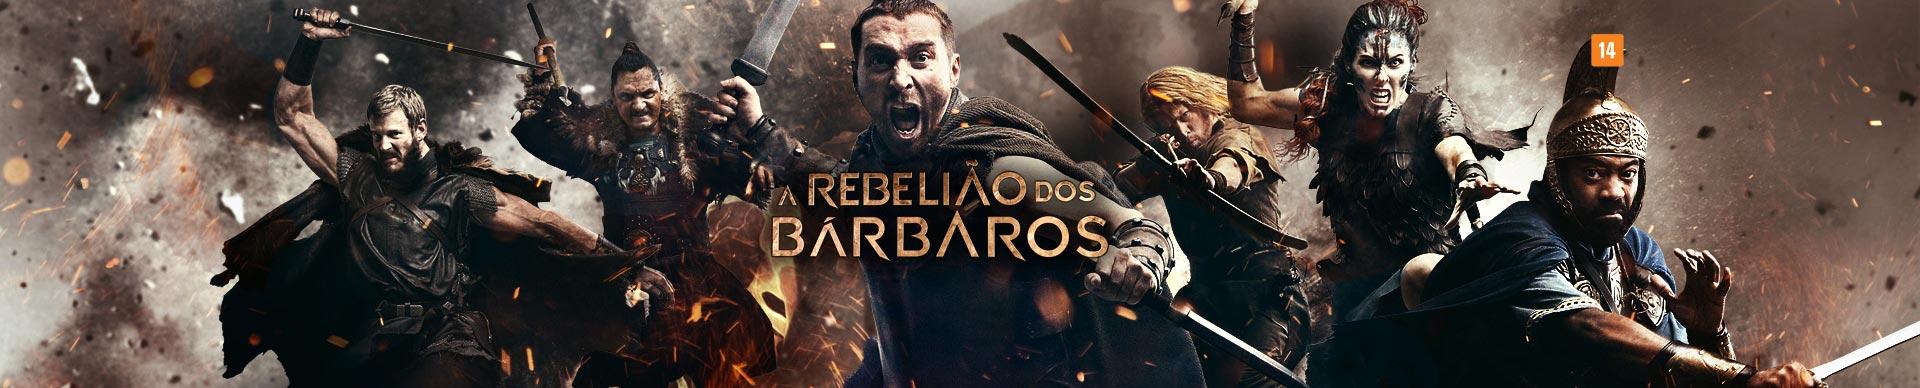 A REBELIÃO DOS BÁRBAROS